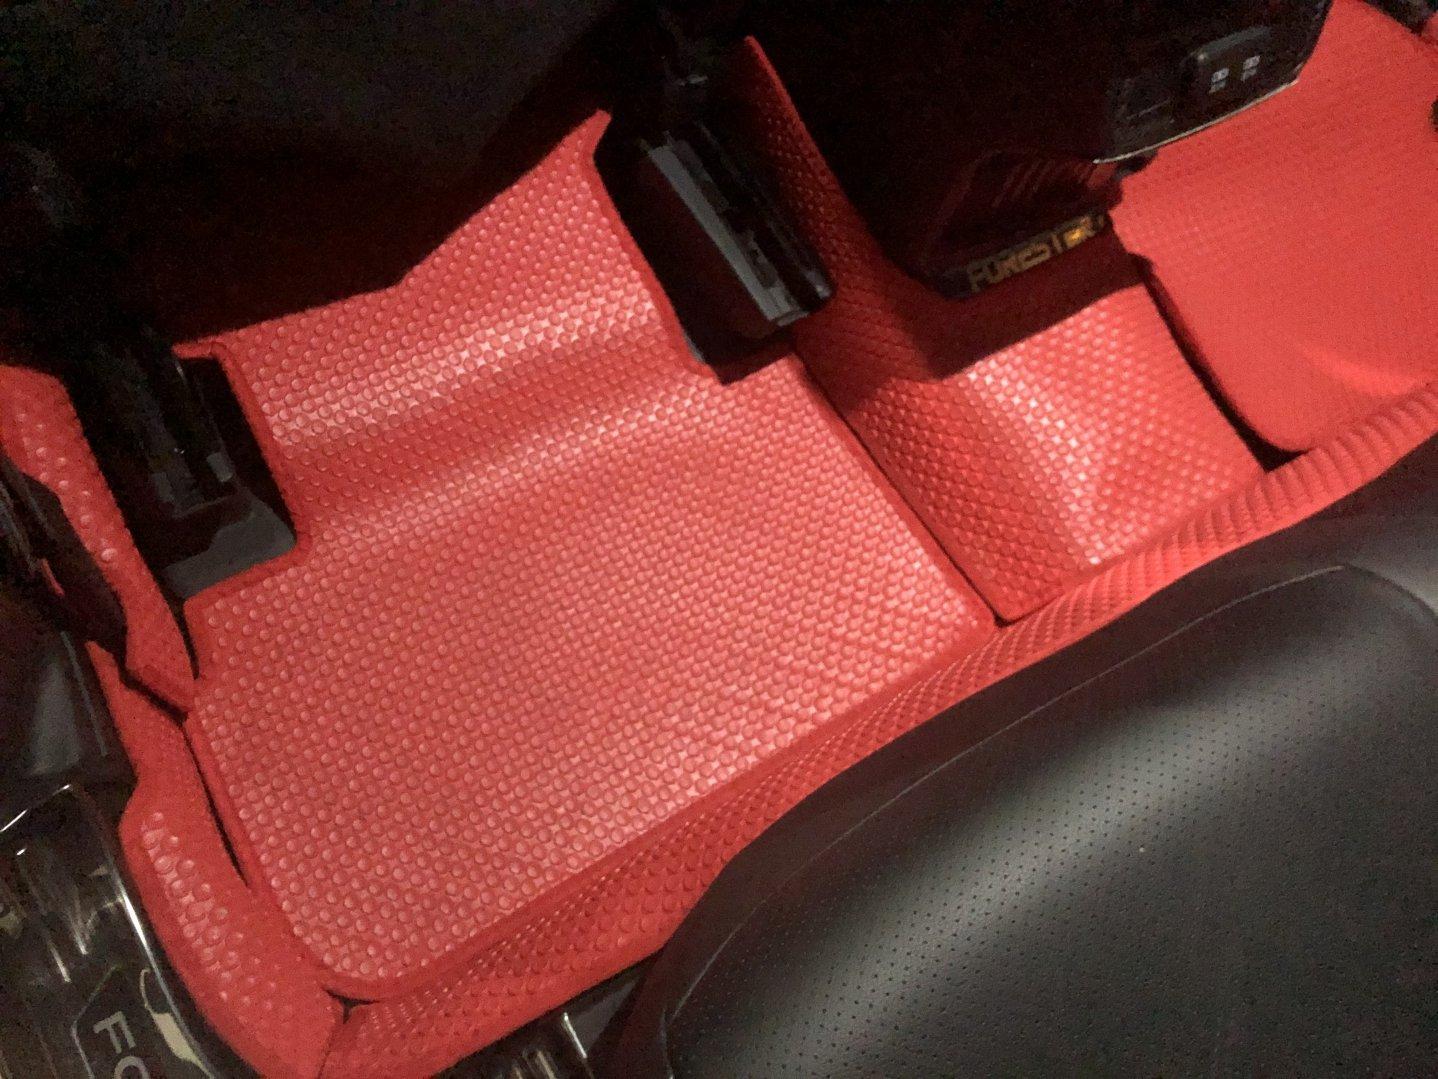 Thảm lót sàn Subaru Forester 2020